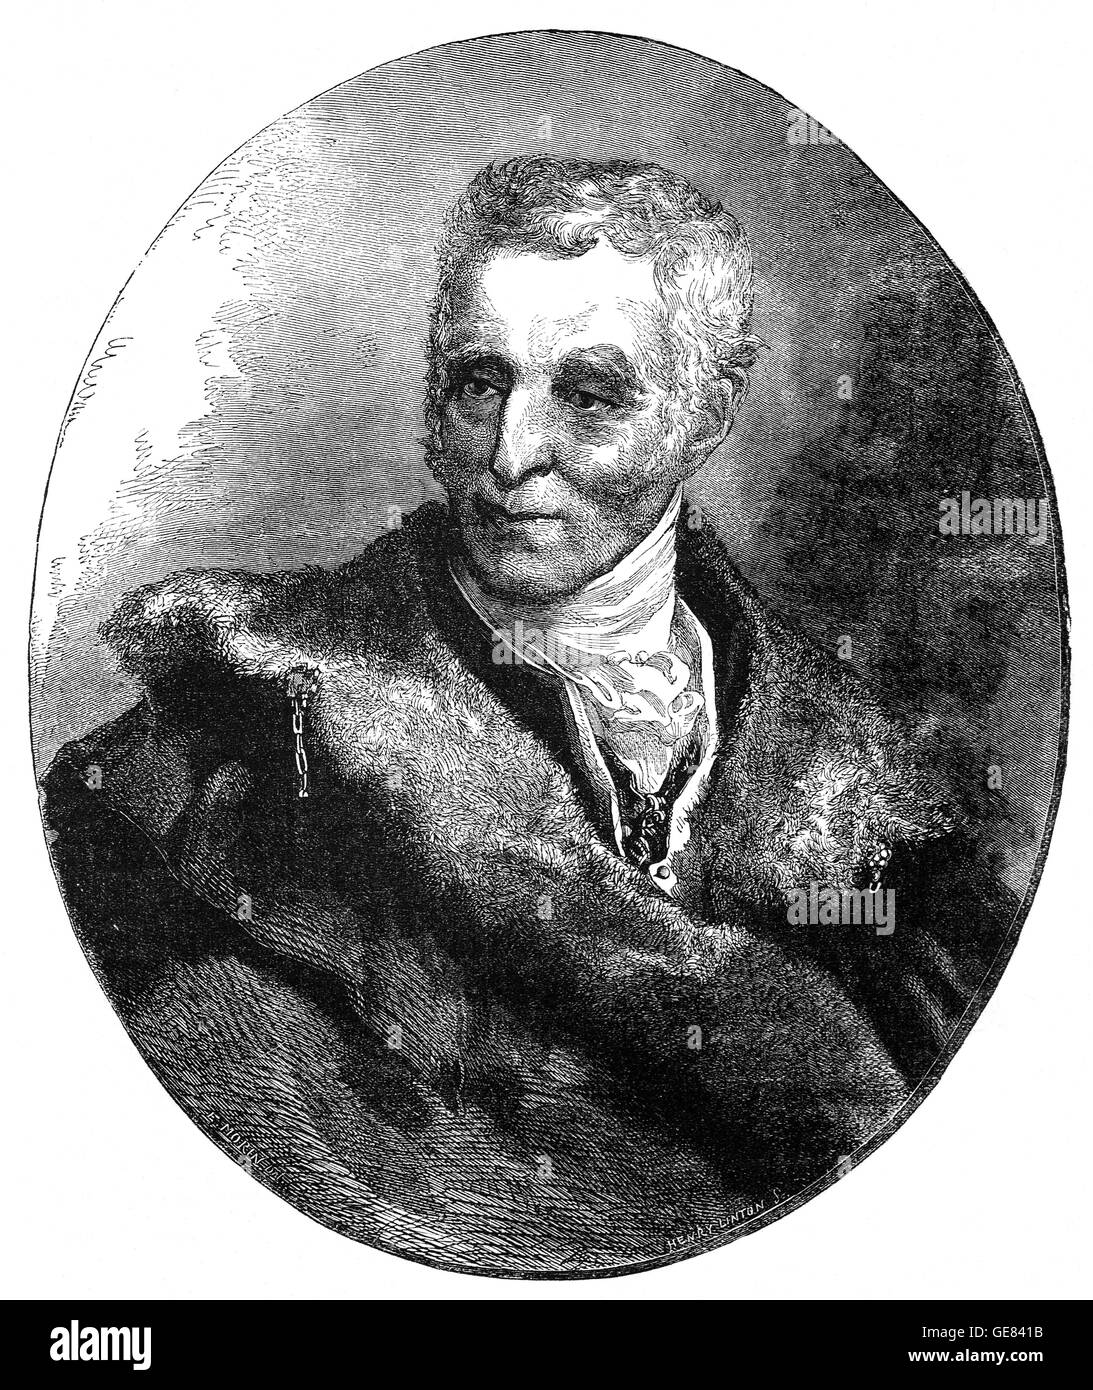 Field Marshal Arthur Wellesley, 1st Duke of Wellington, (1769 – 1852), was an Anglo-Irish soldier and statesman. - Stock Image